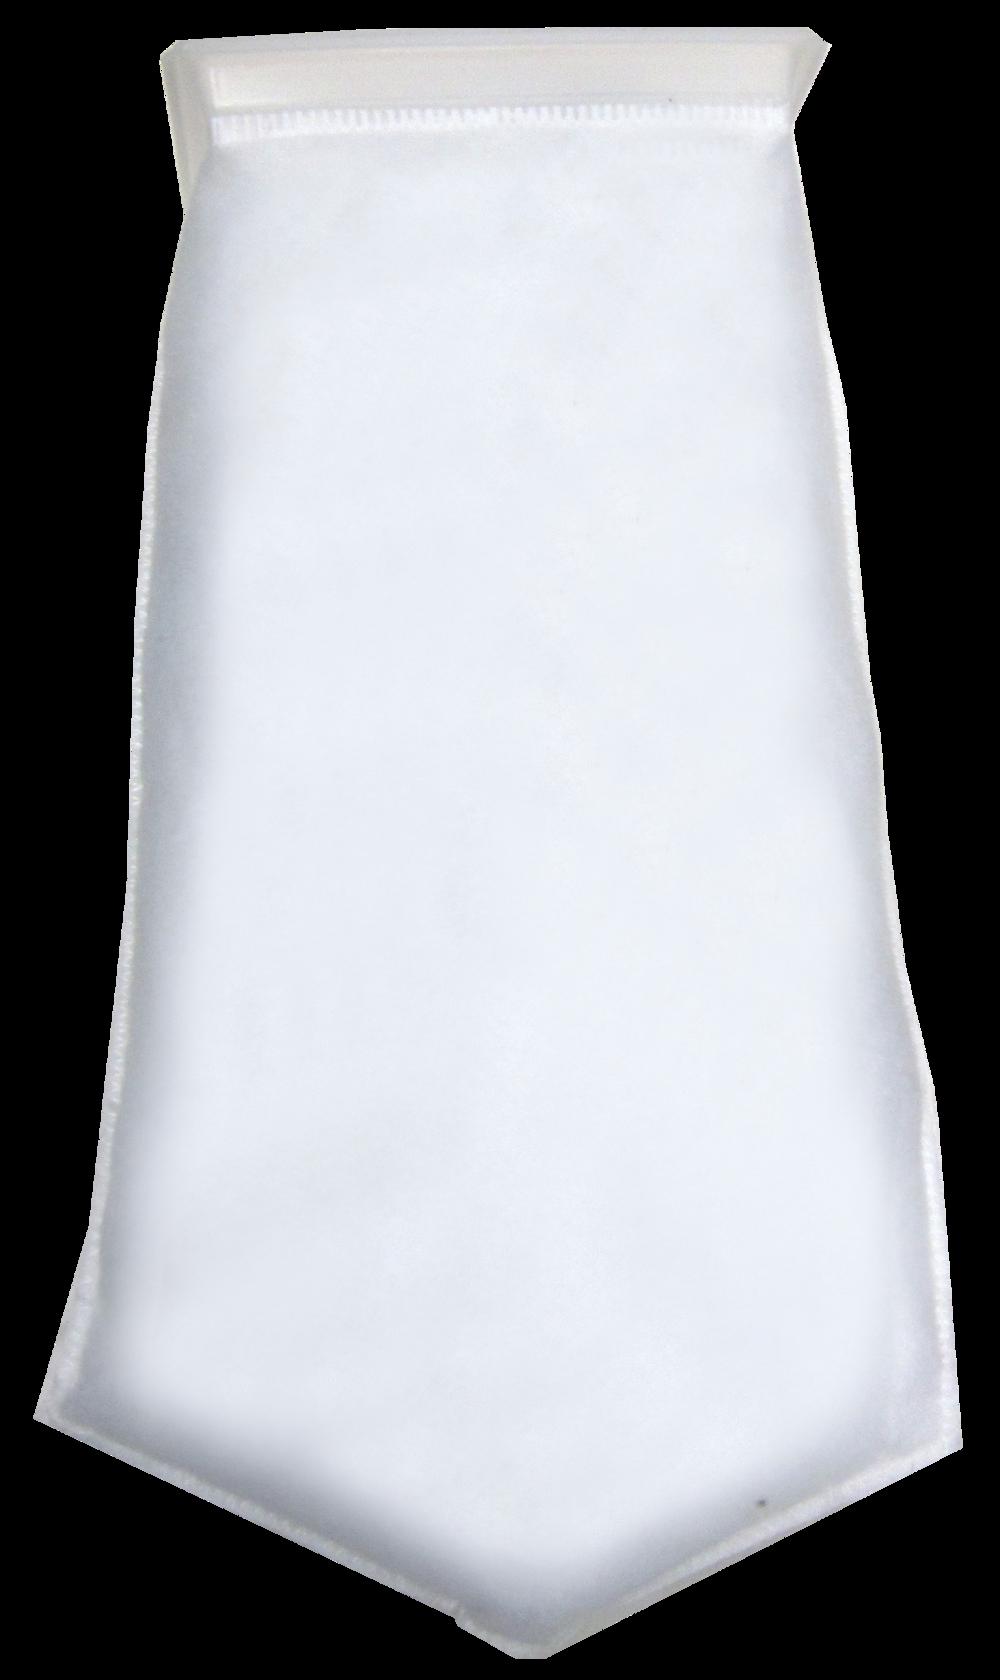 "4.5"" Rectangular 200 Micron Filter Sock   SKU#: AM87804  UPC#: 7-49729-87804-  Product Dimension: 7""x4.5""x16""  Master Carton Dimension: ""  Master pack: 48pcs"